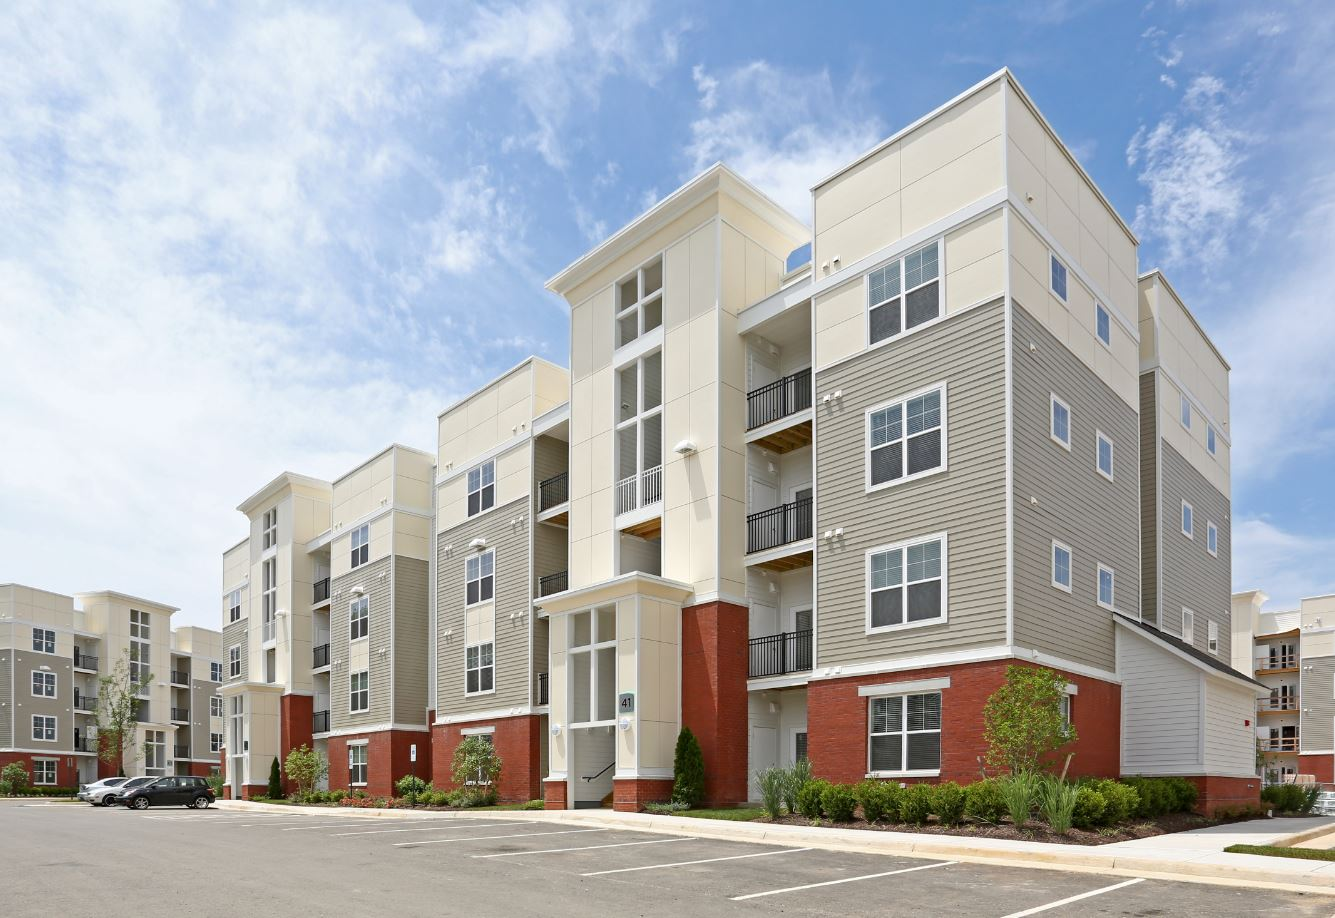 Aquia Fifteen Apartments At Towne Center In Stafford Va 22554